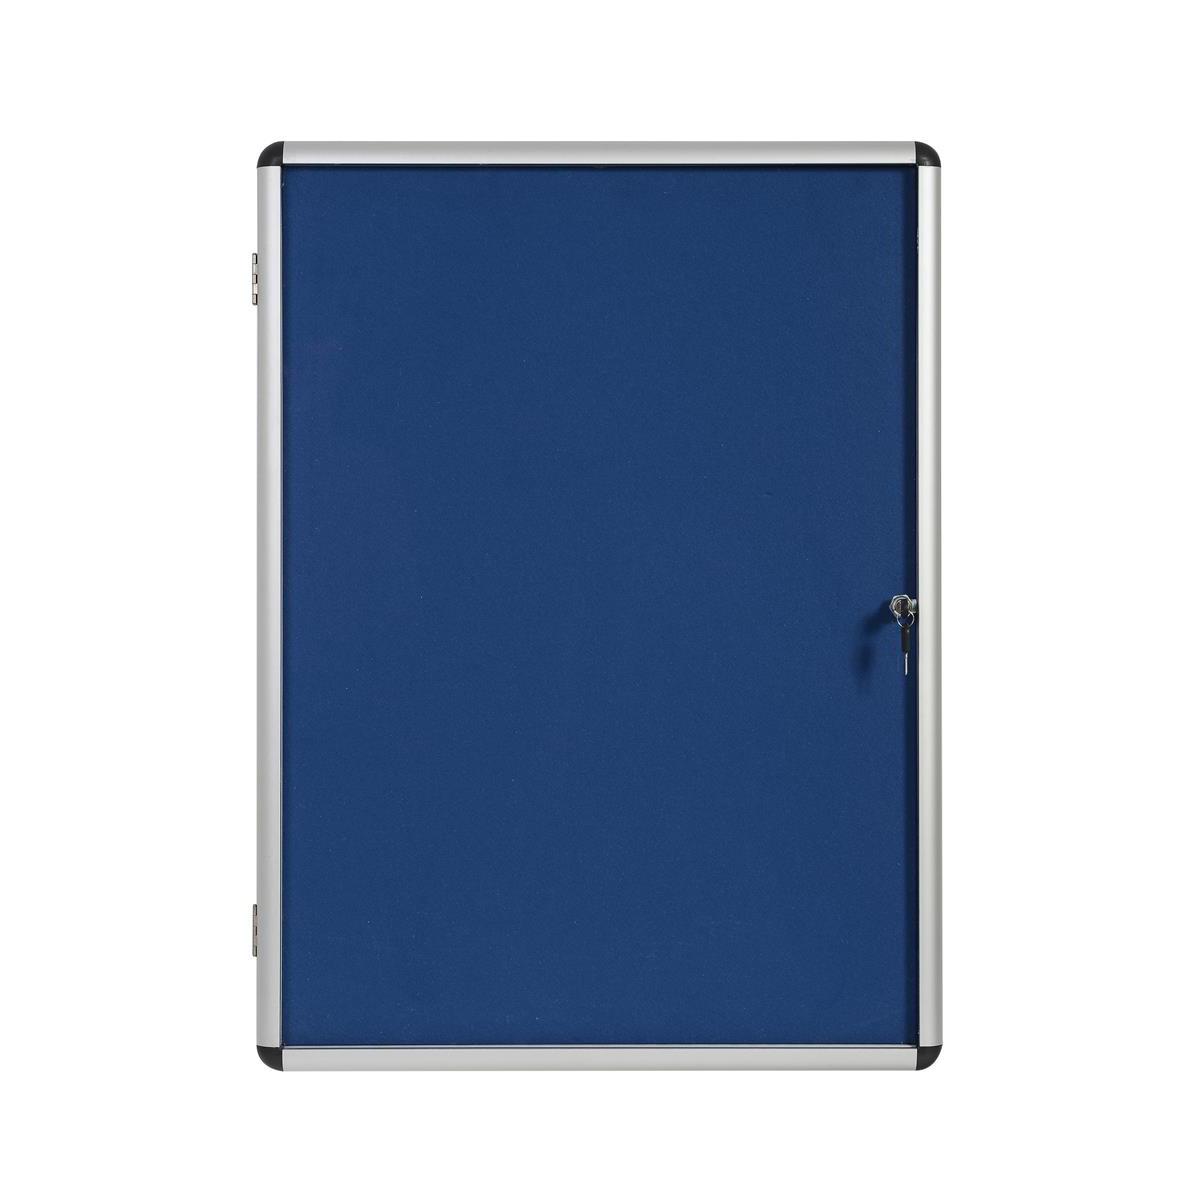 5 Star Office Noticeboard Glazed Lockable Aluminium Trim Blue Felt Board H1200xW900mm